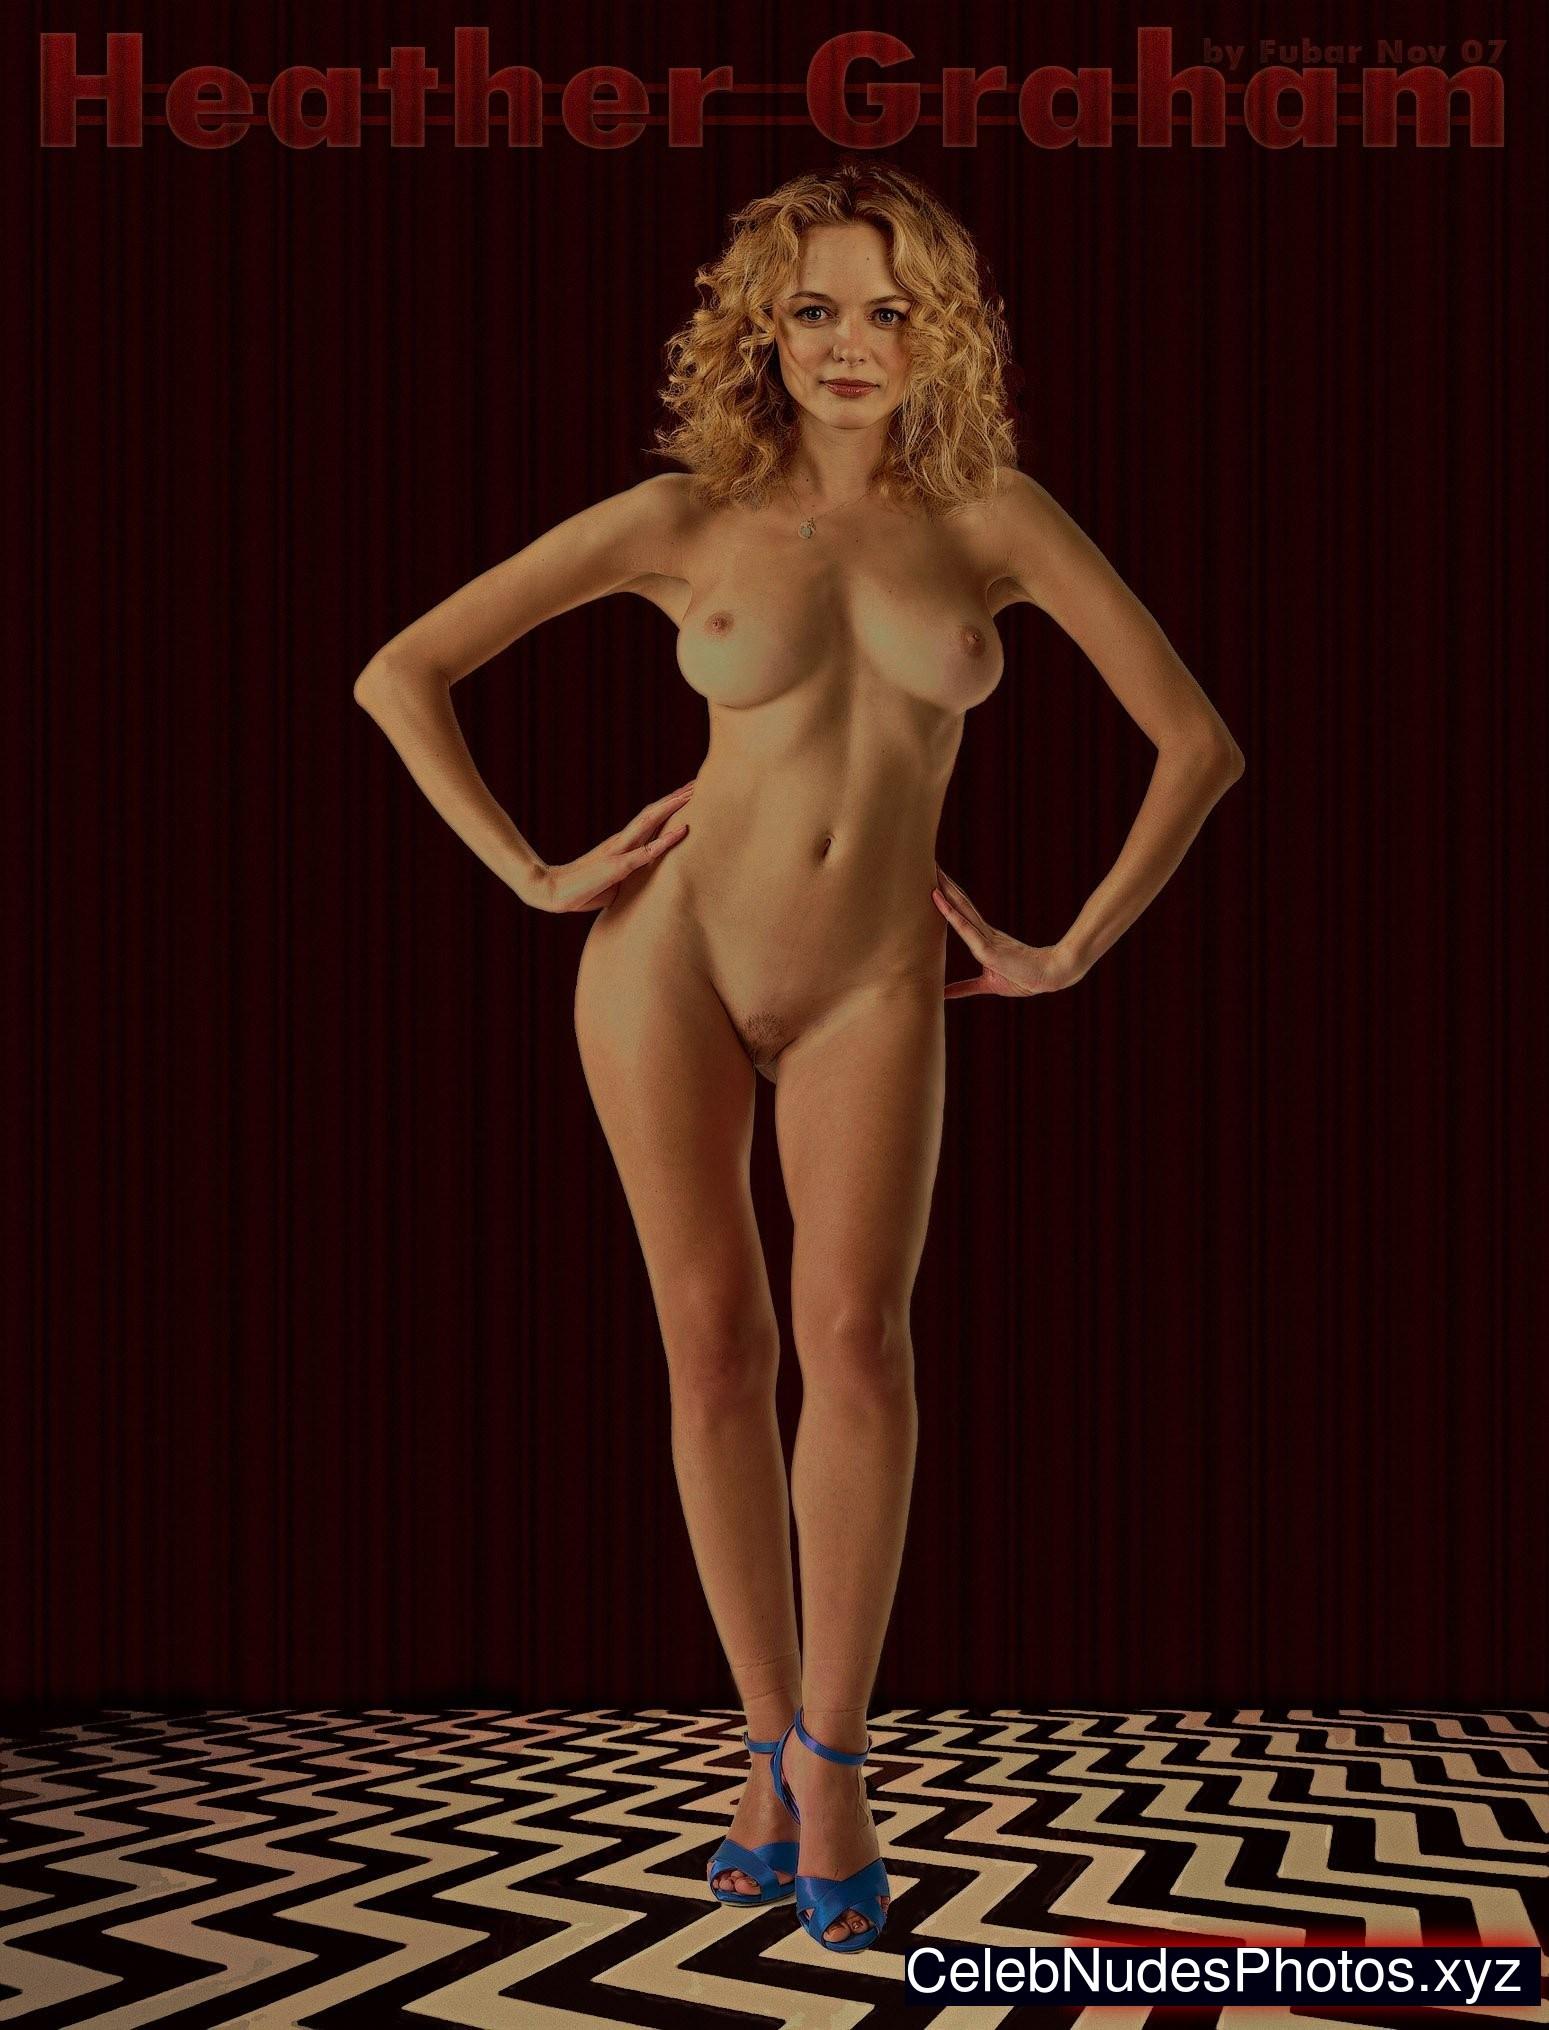 Stacey poole nude gif